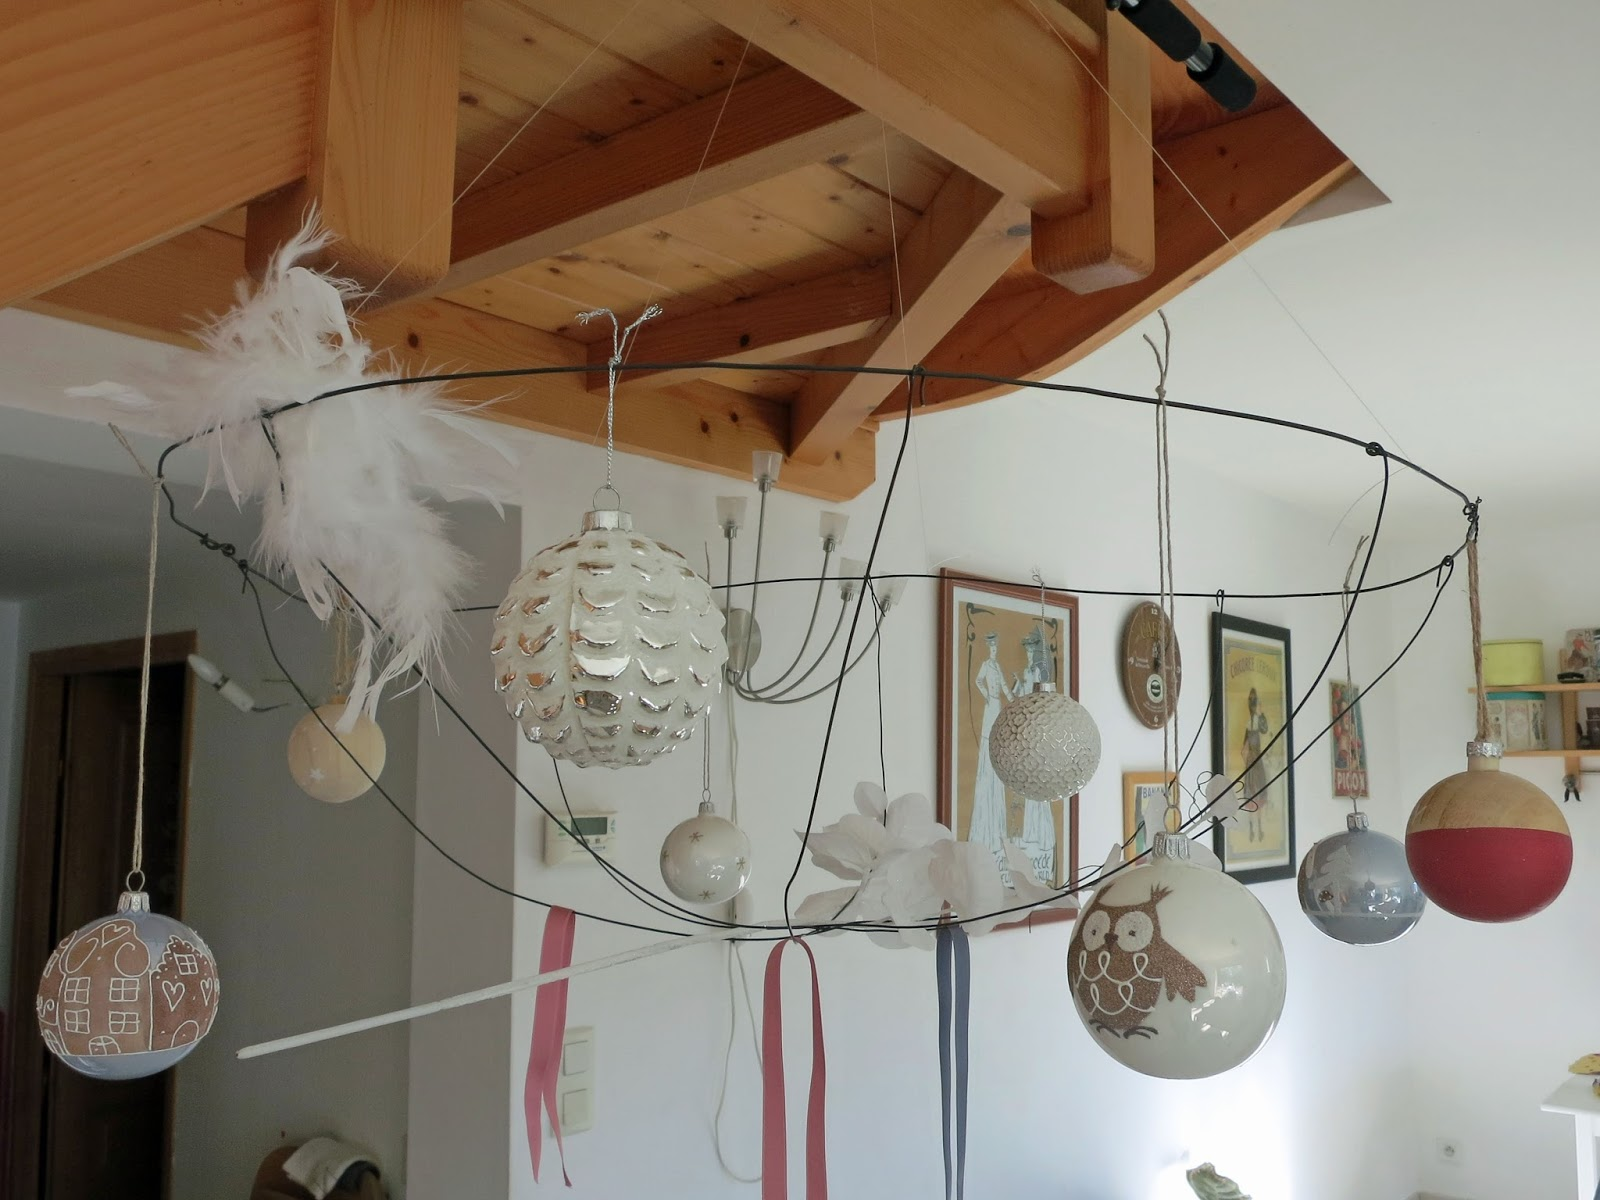 Decoration Noel Suspension Plafond Noel Magique En Europe